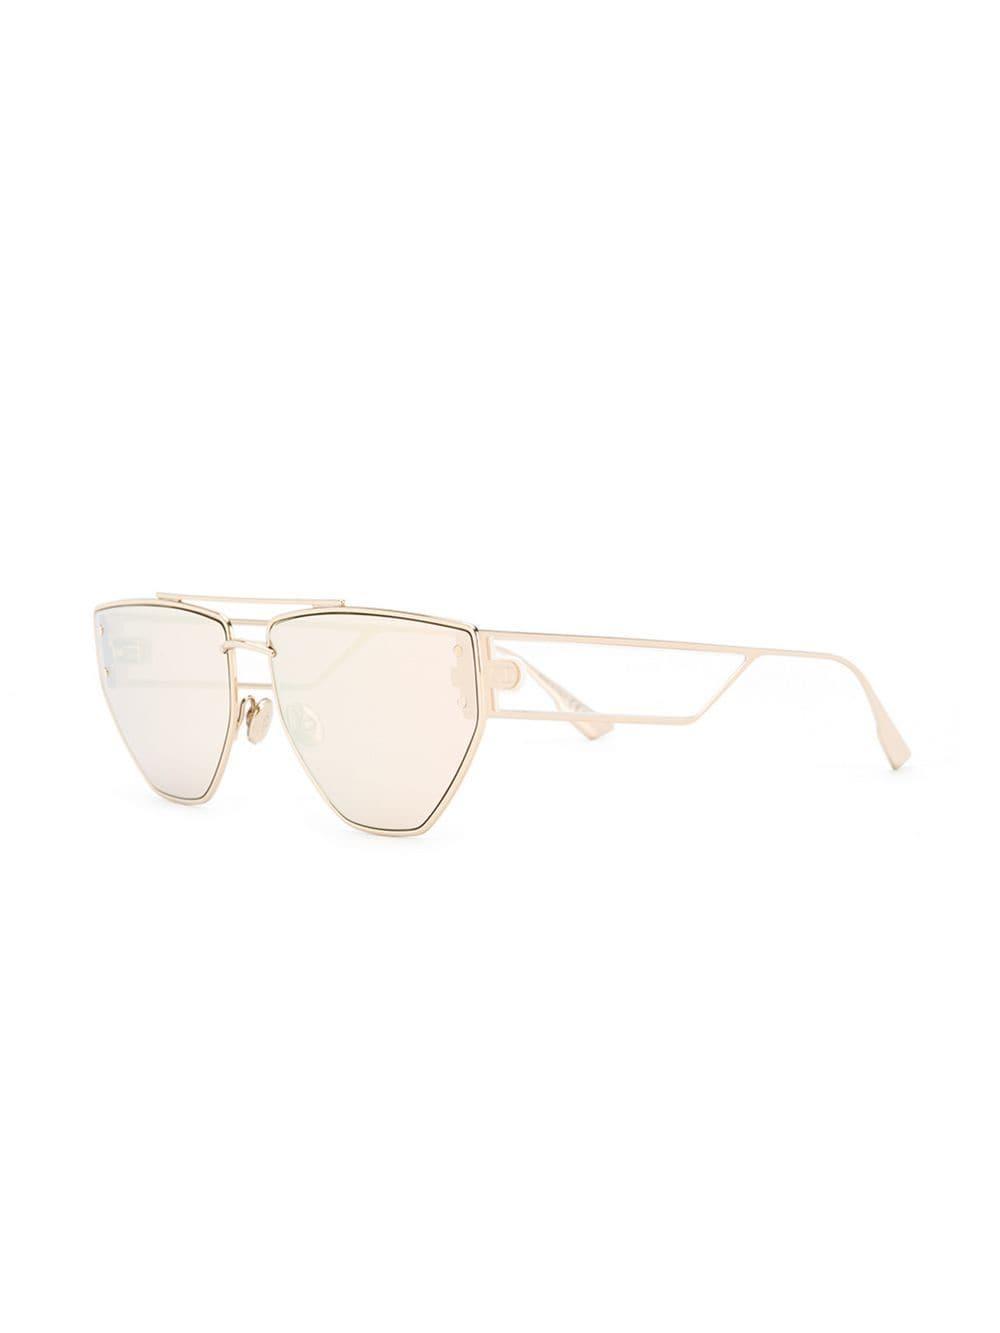 Dior Glasses In Lyst Stellaire Metallic nwOXP80k